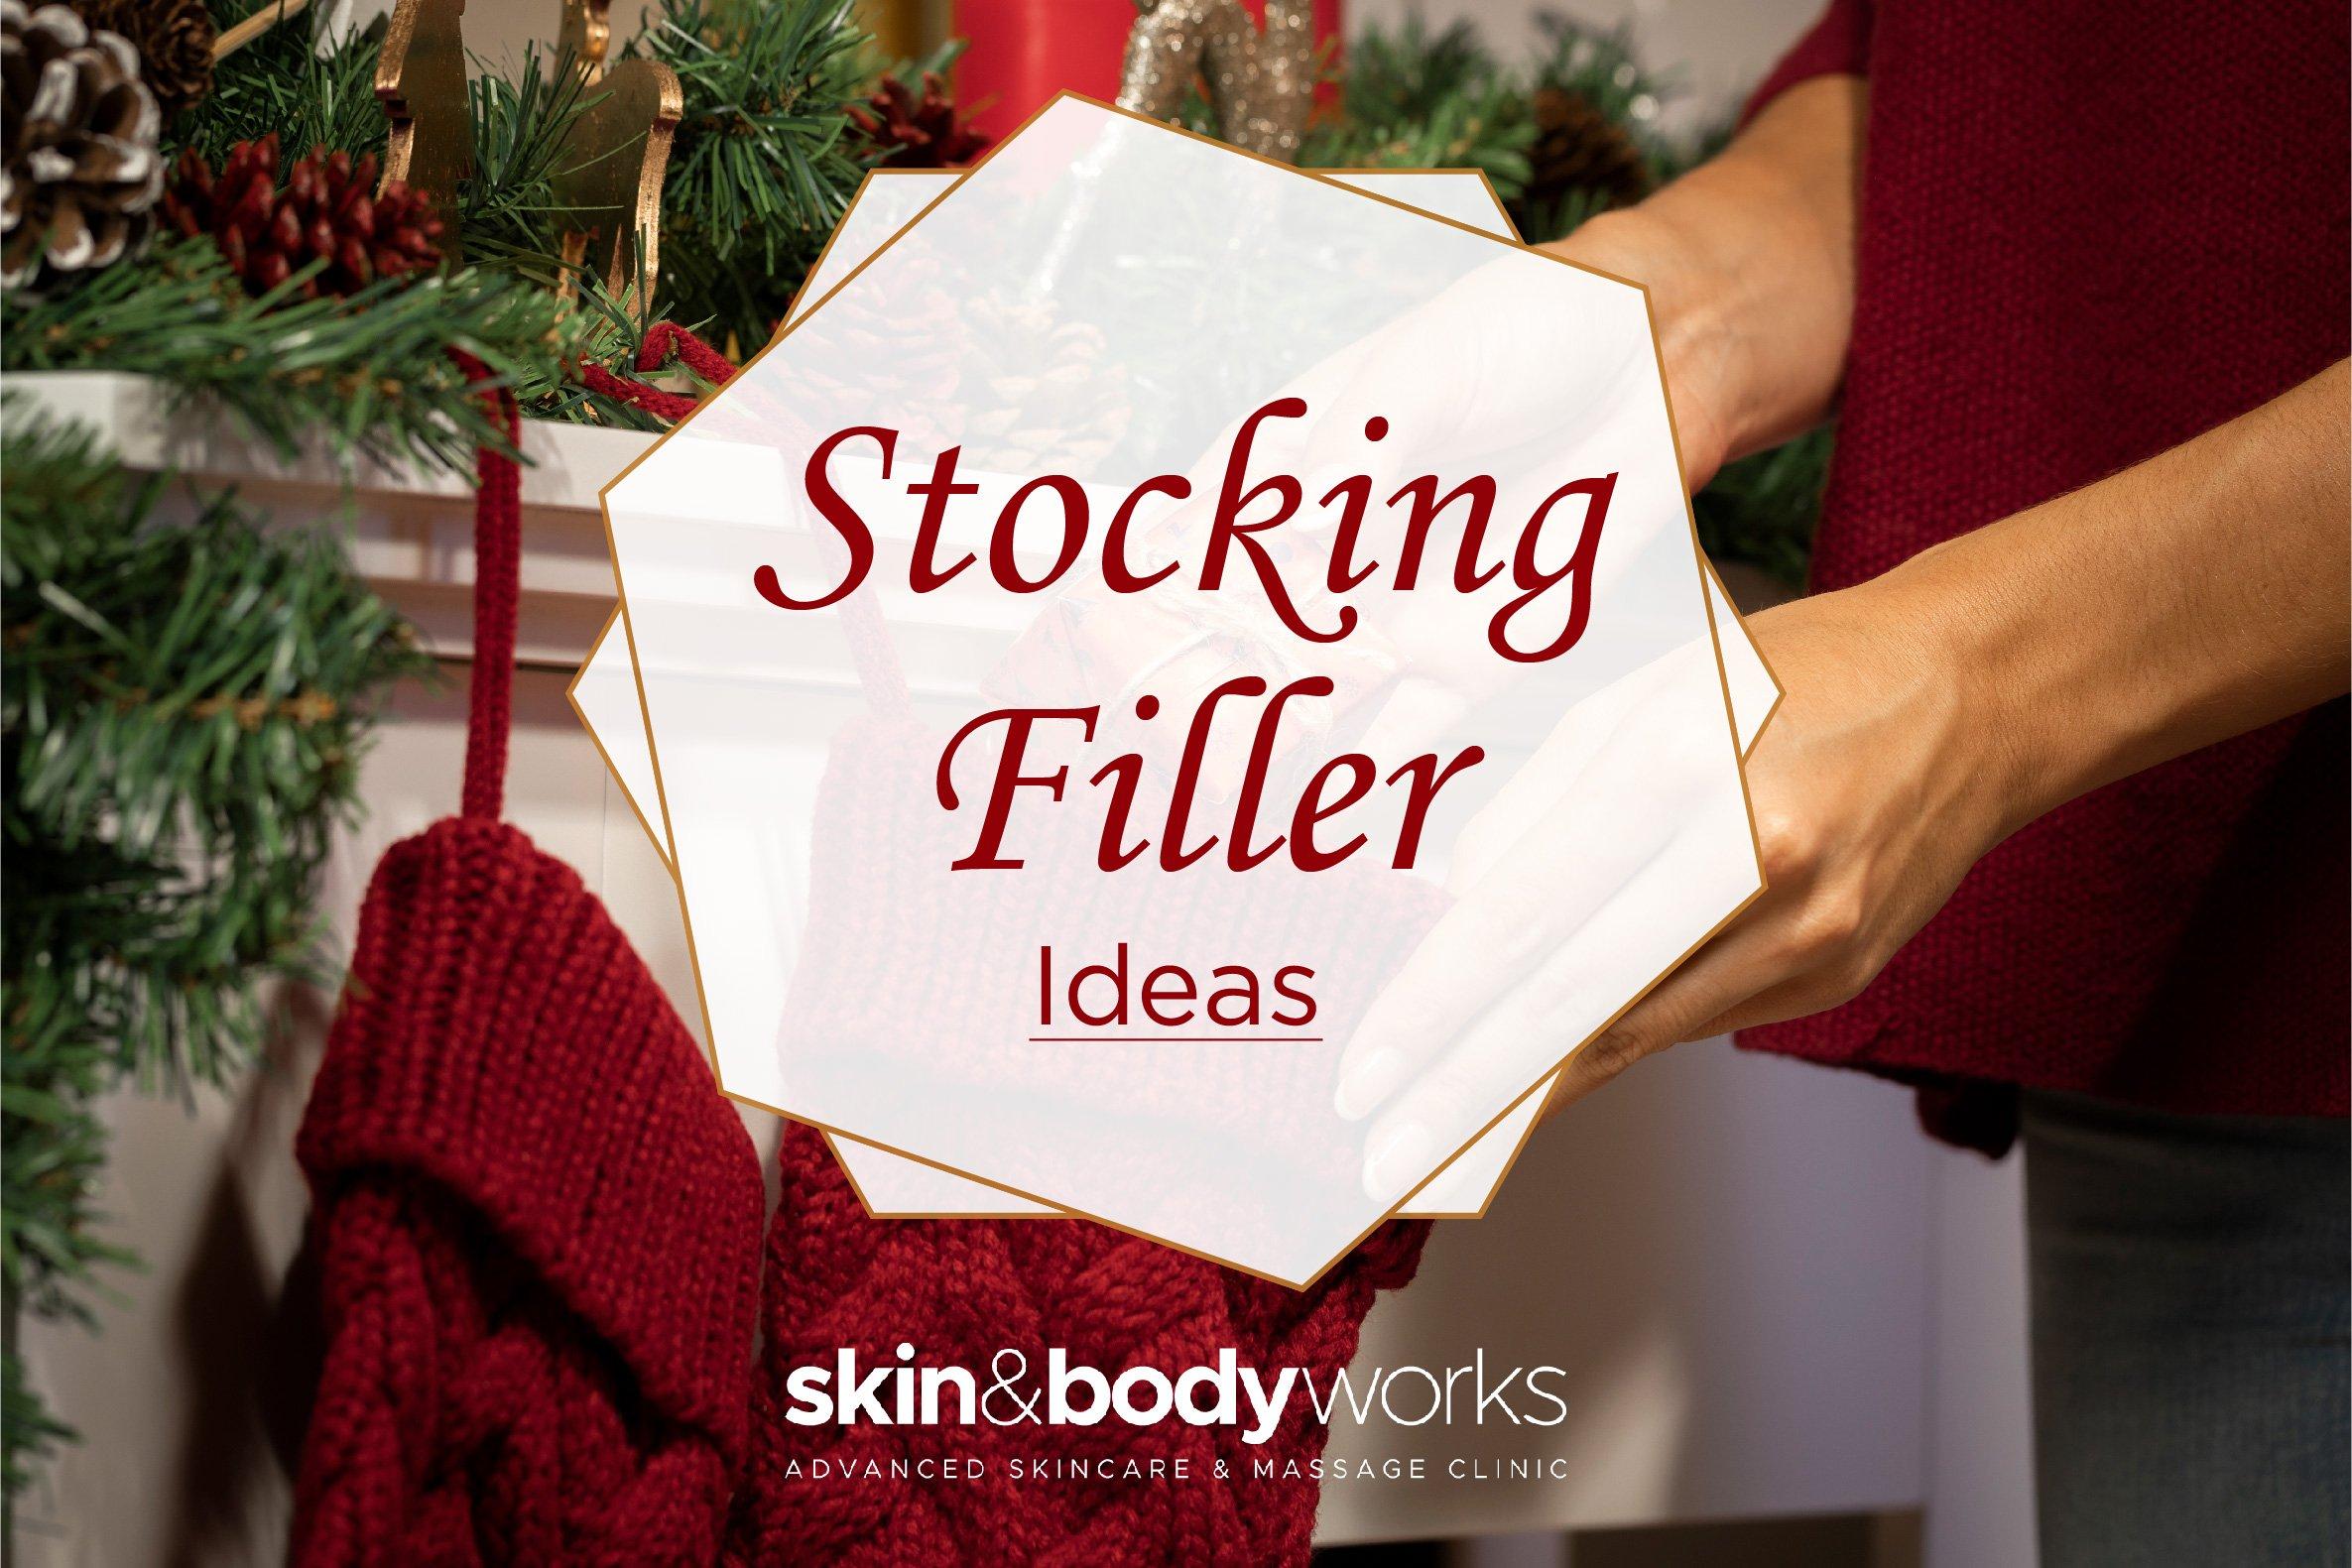 Stocking Filler Ideas!